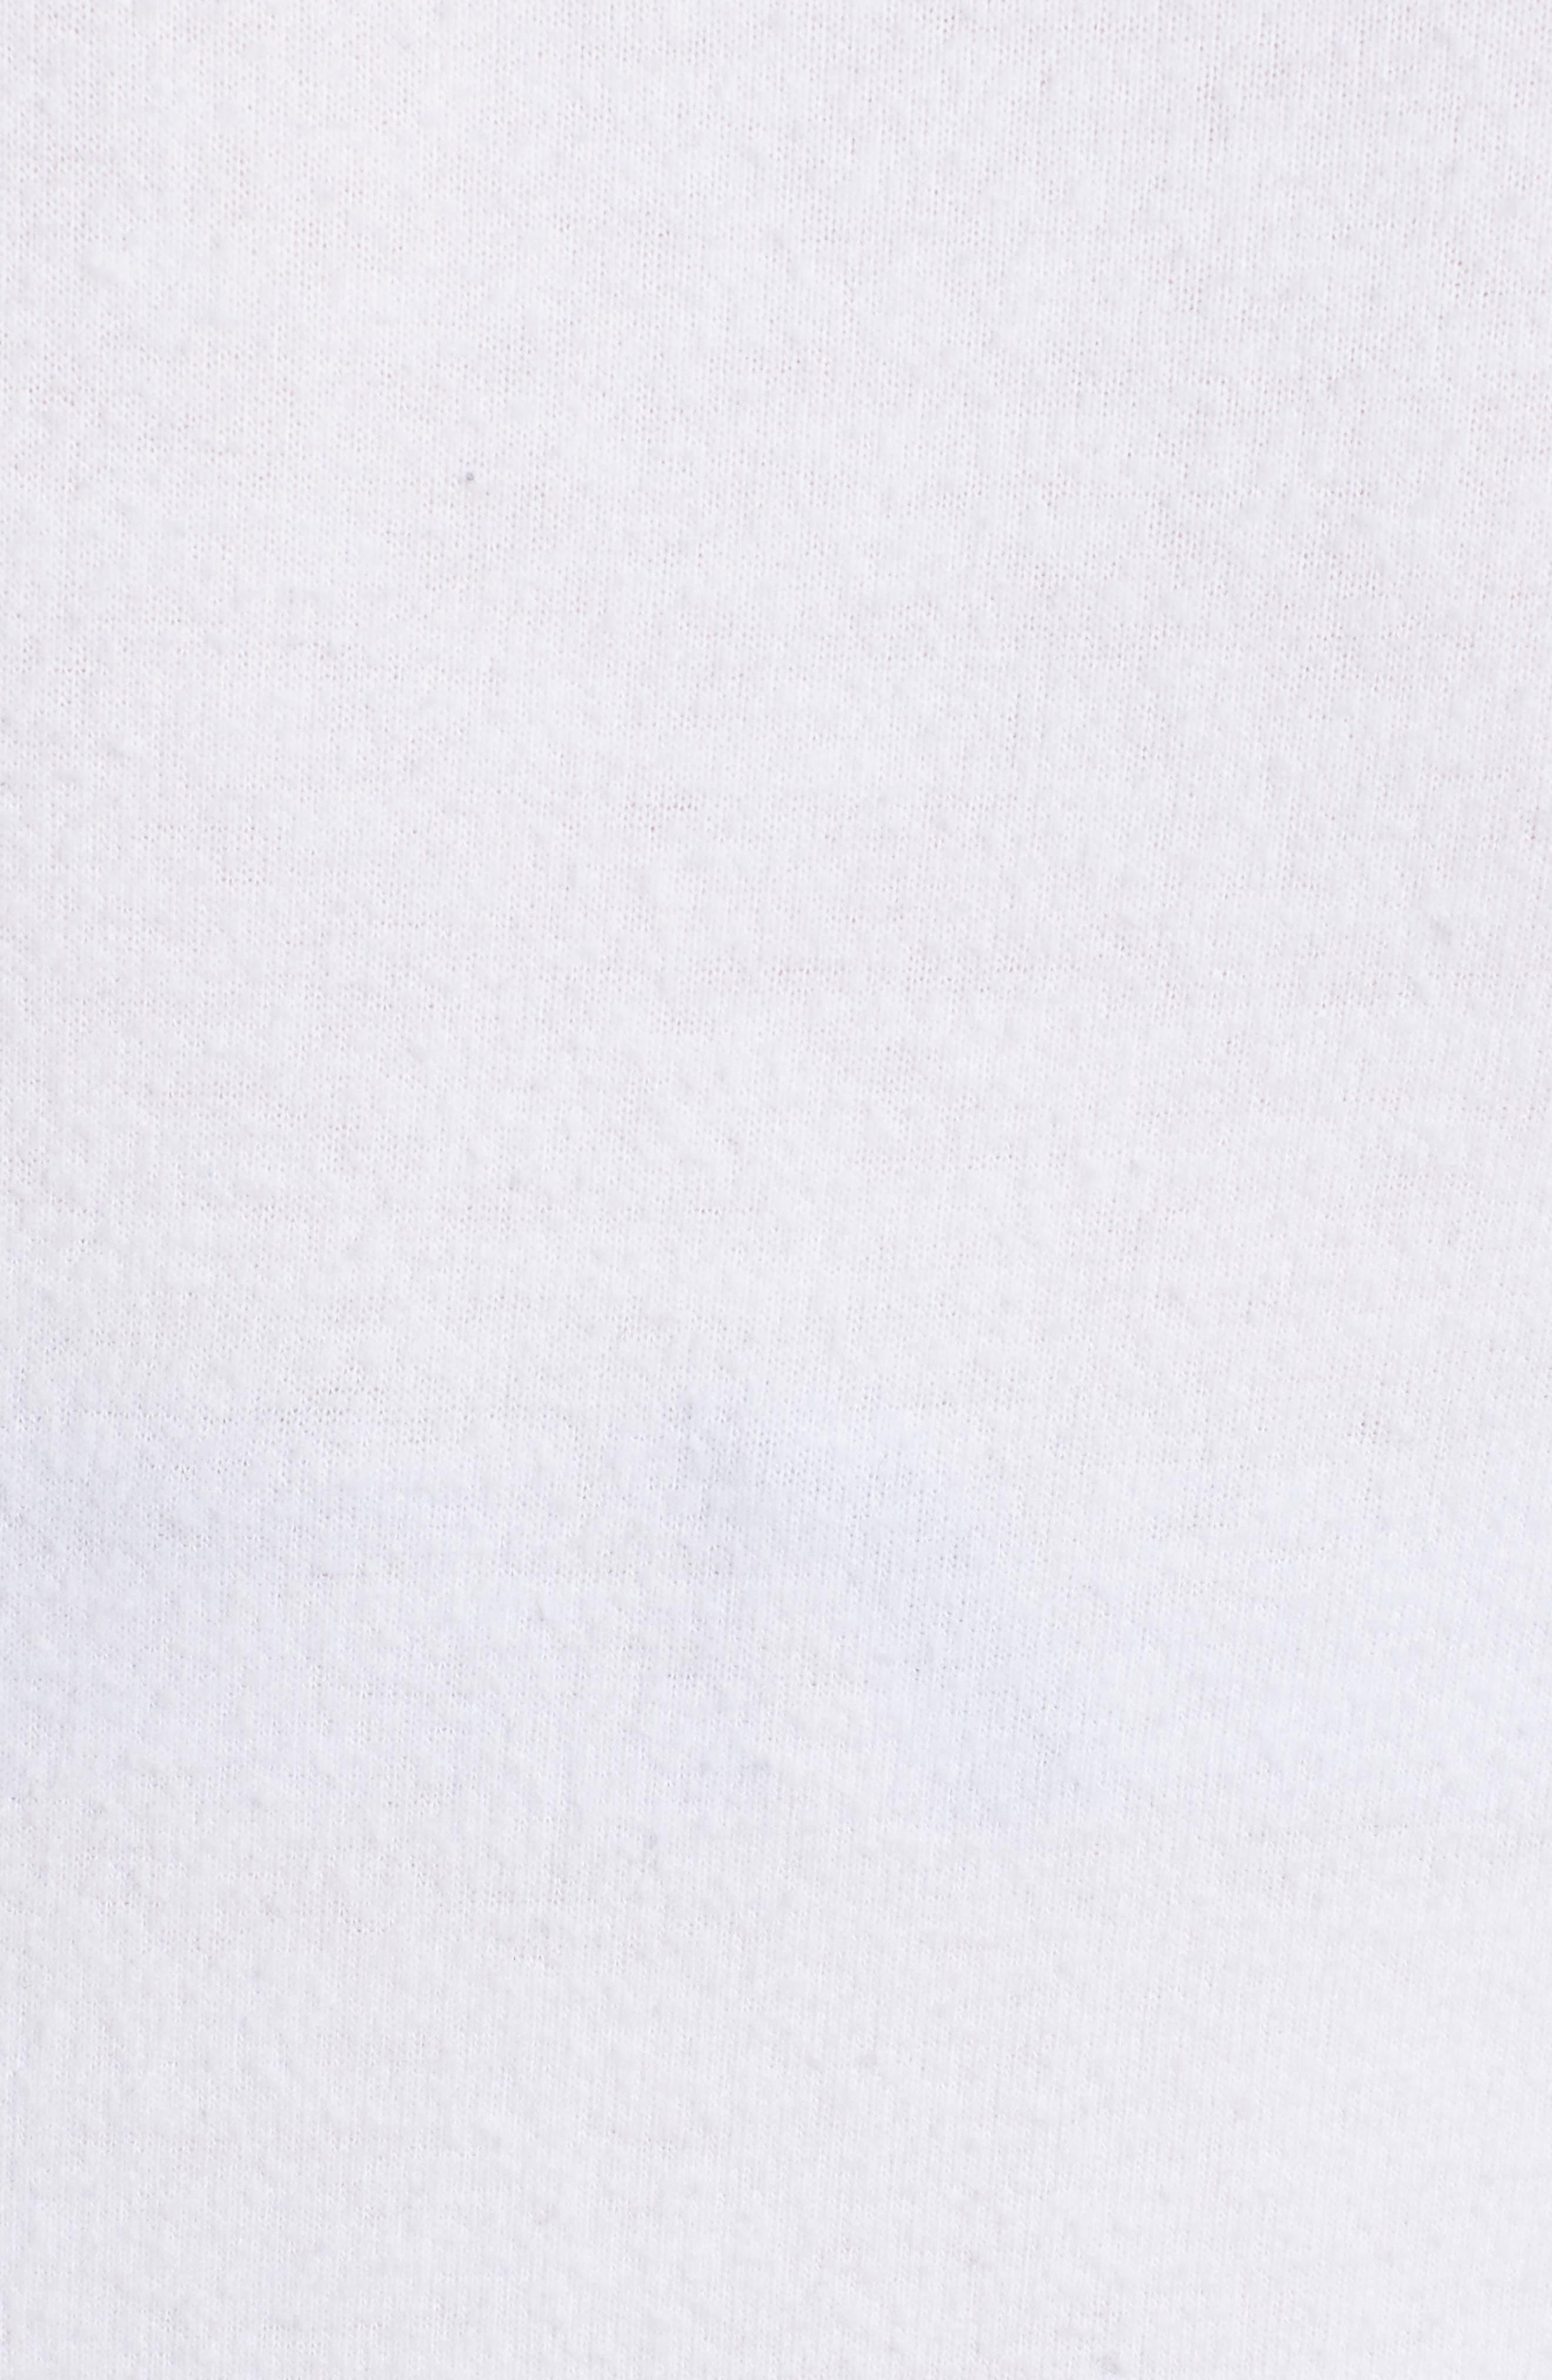 Peace Sweatshirt,                             Alternate thumbnail 5, color,                             White